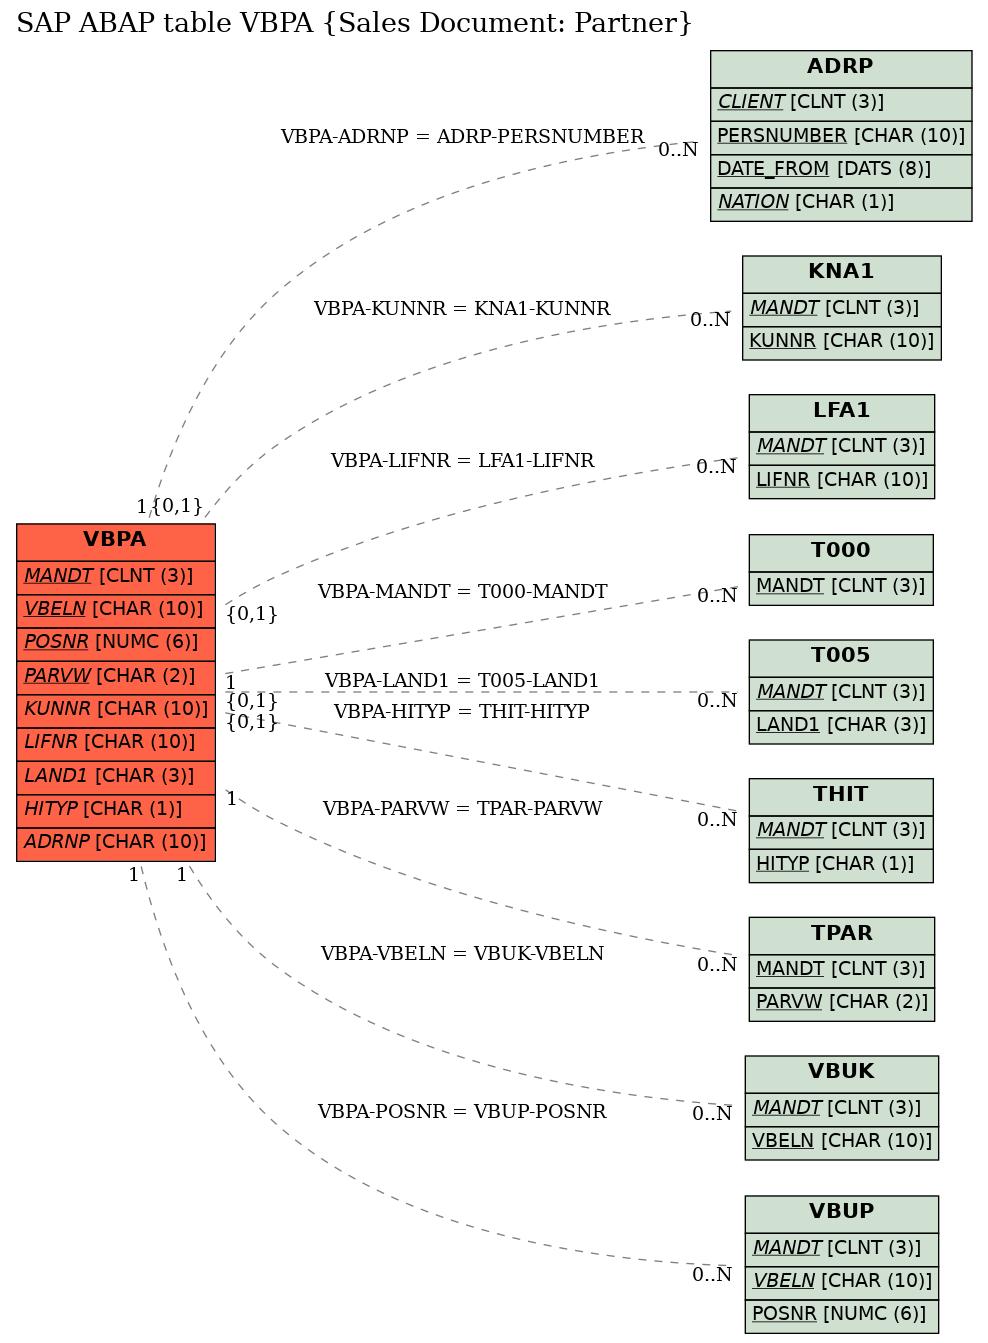 E-R Diagram for table VBPA (Sales Document: Partner)